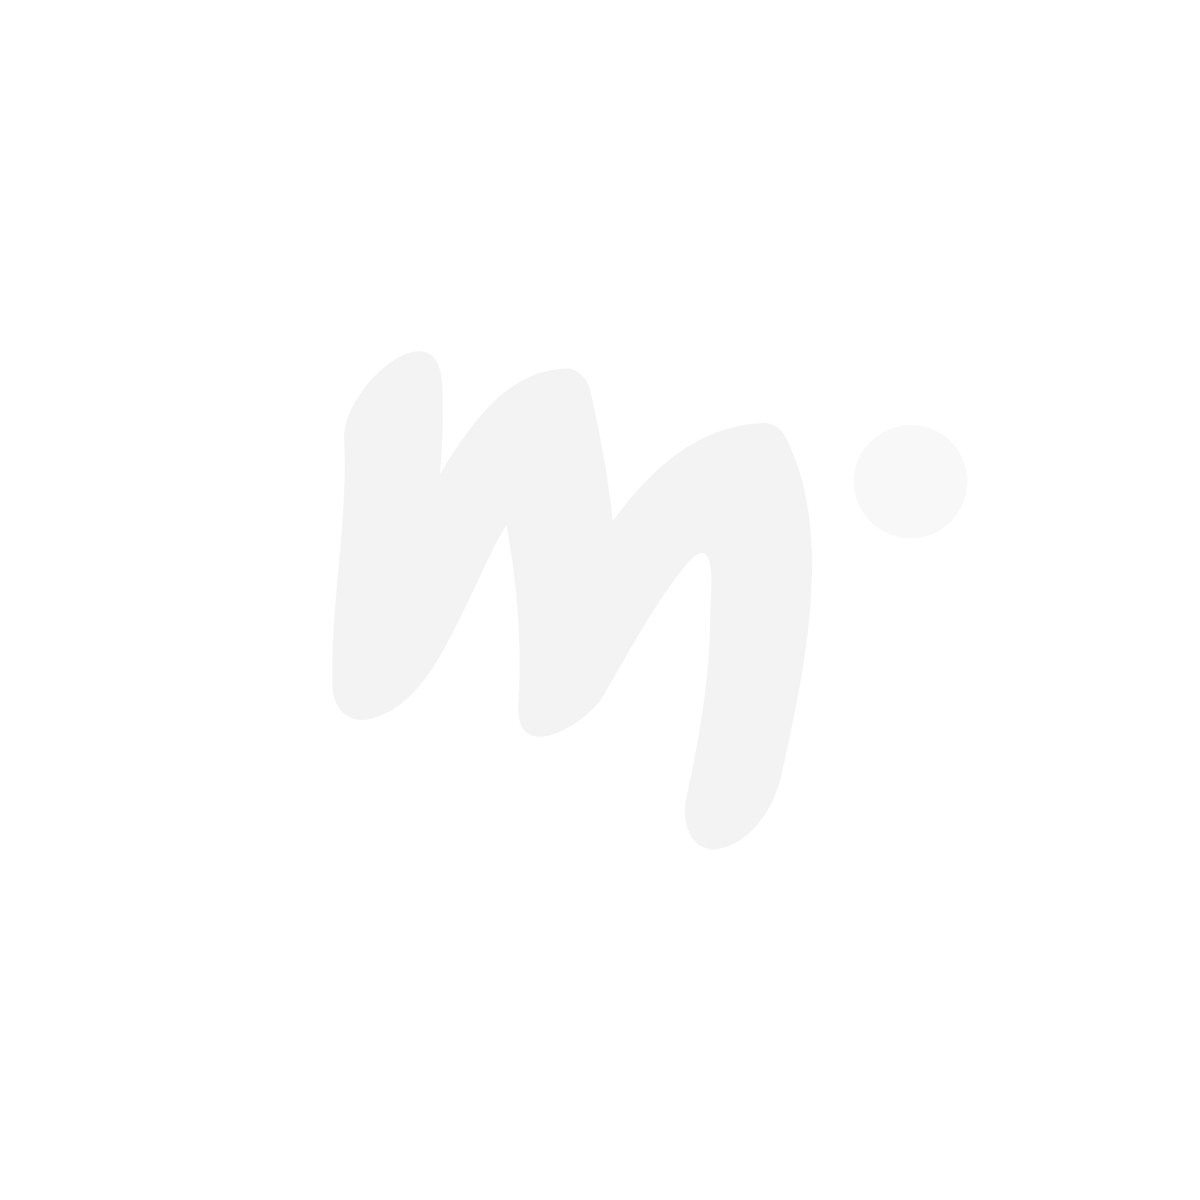 Muumi Moominvalley Purjehdus -kahvipurkki